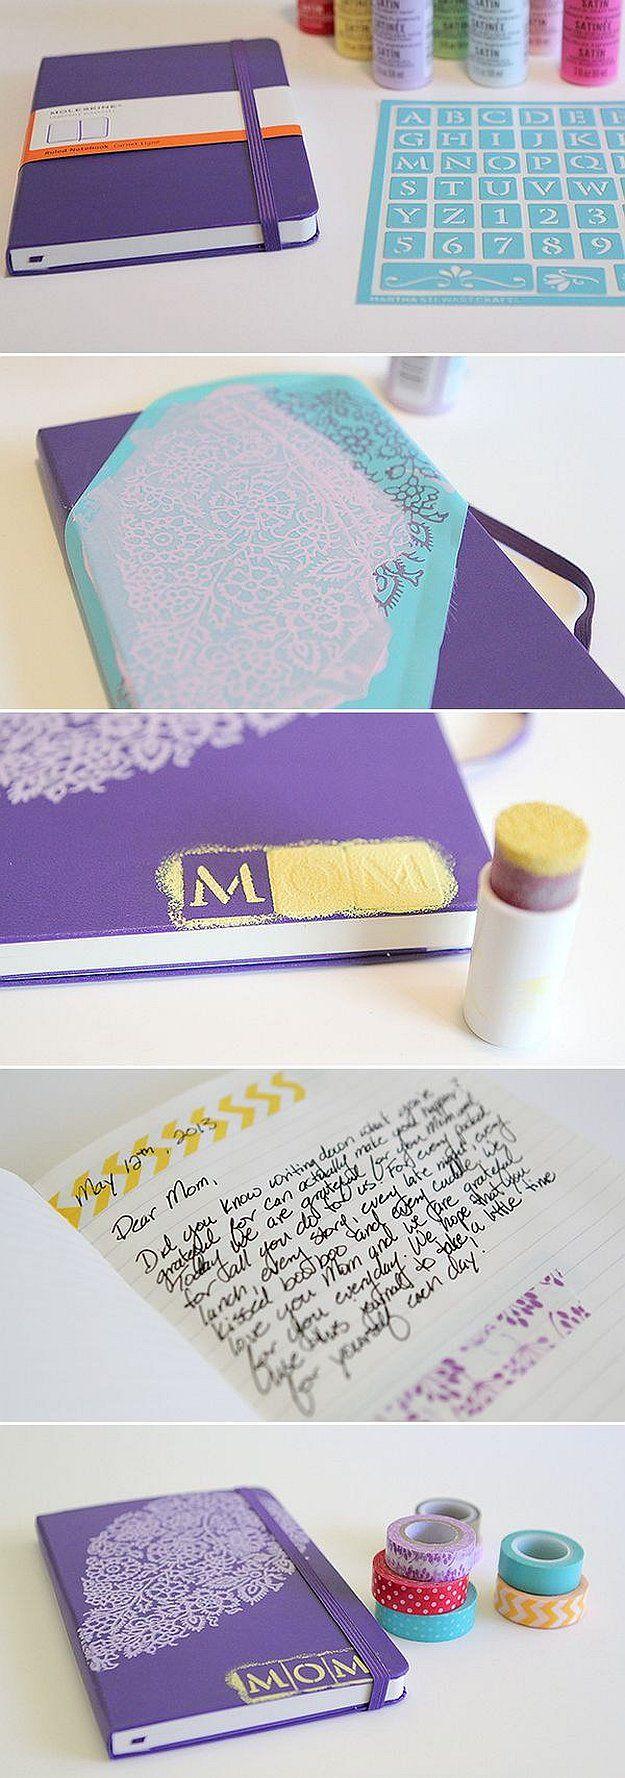 10 Diy Birthday Gift Ideas For Mom Mom Birthday Gift